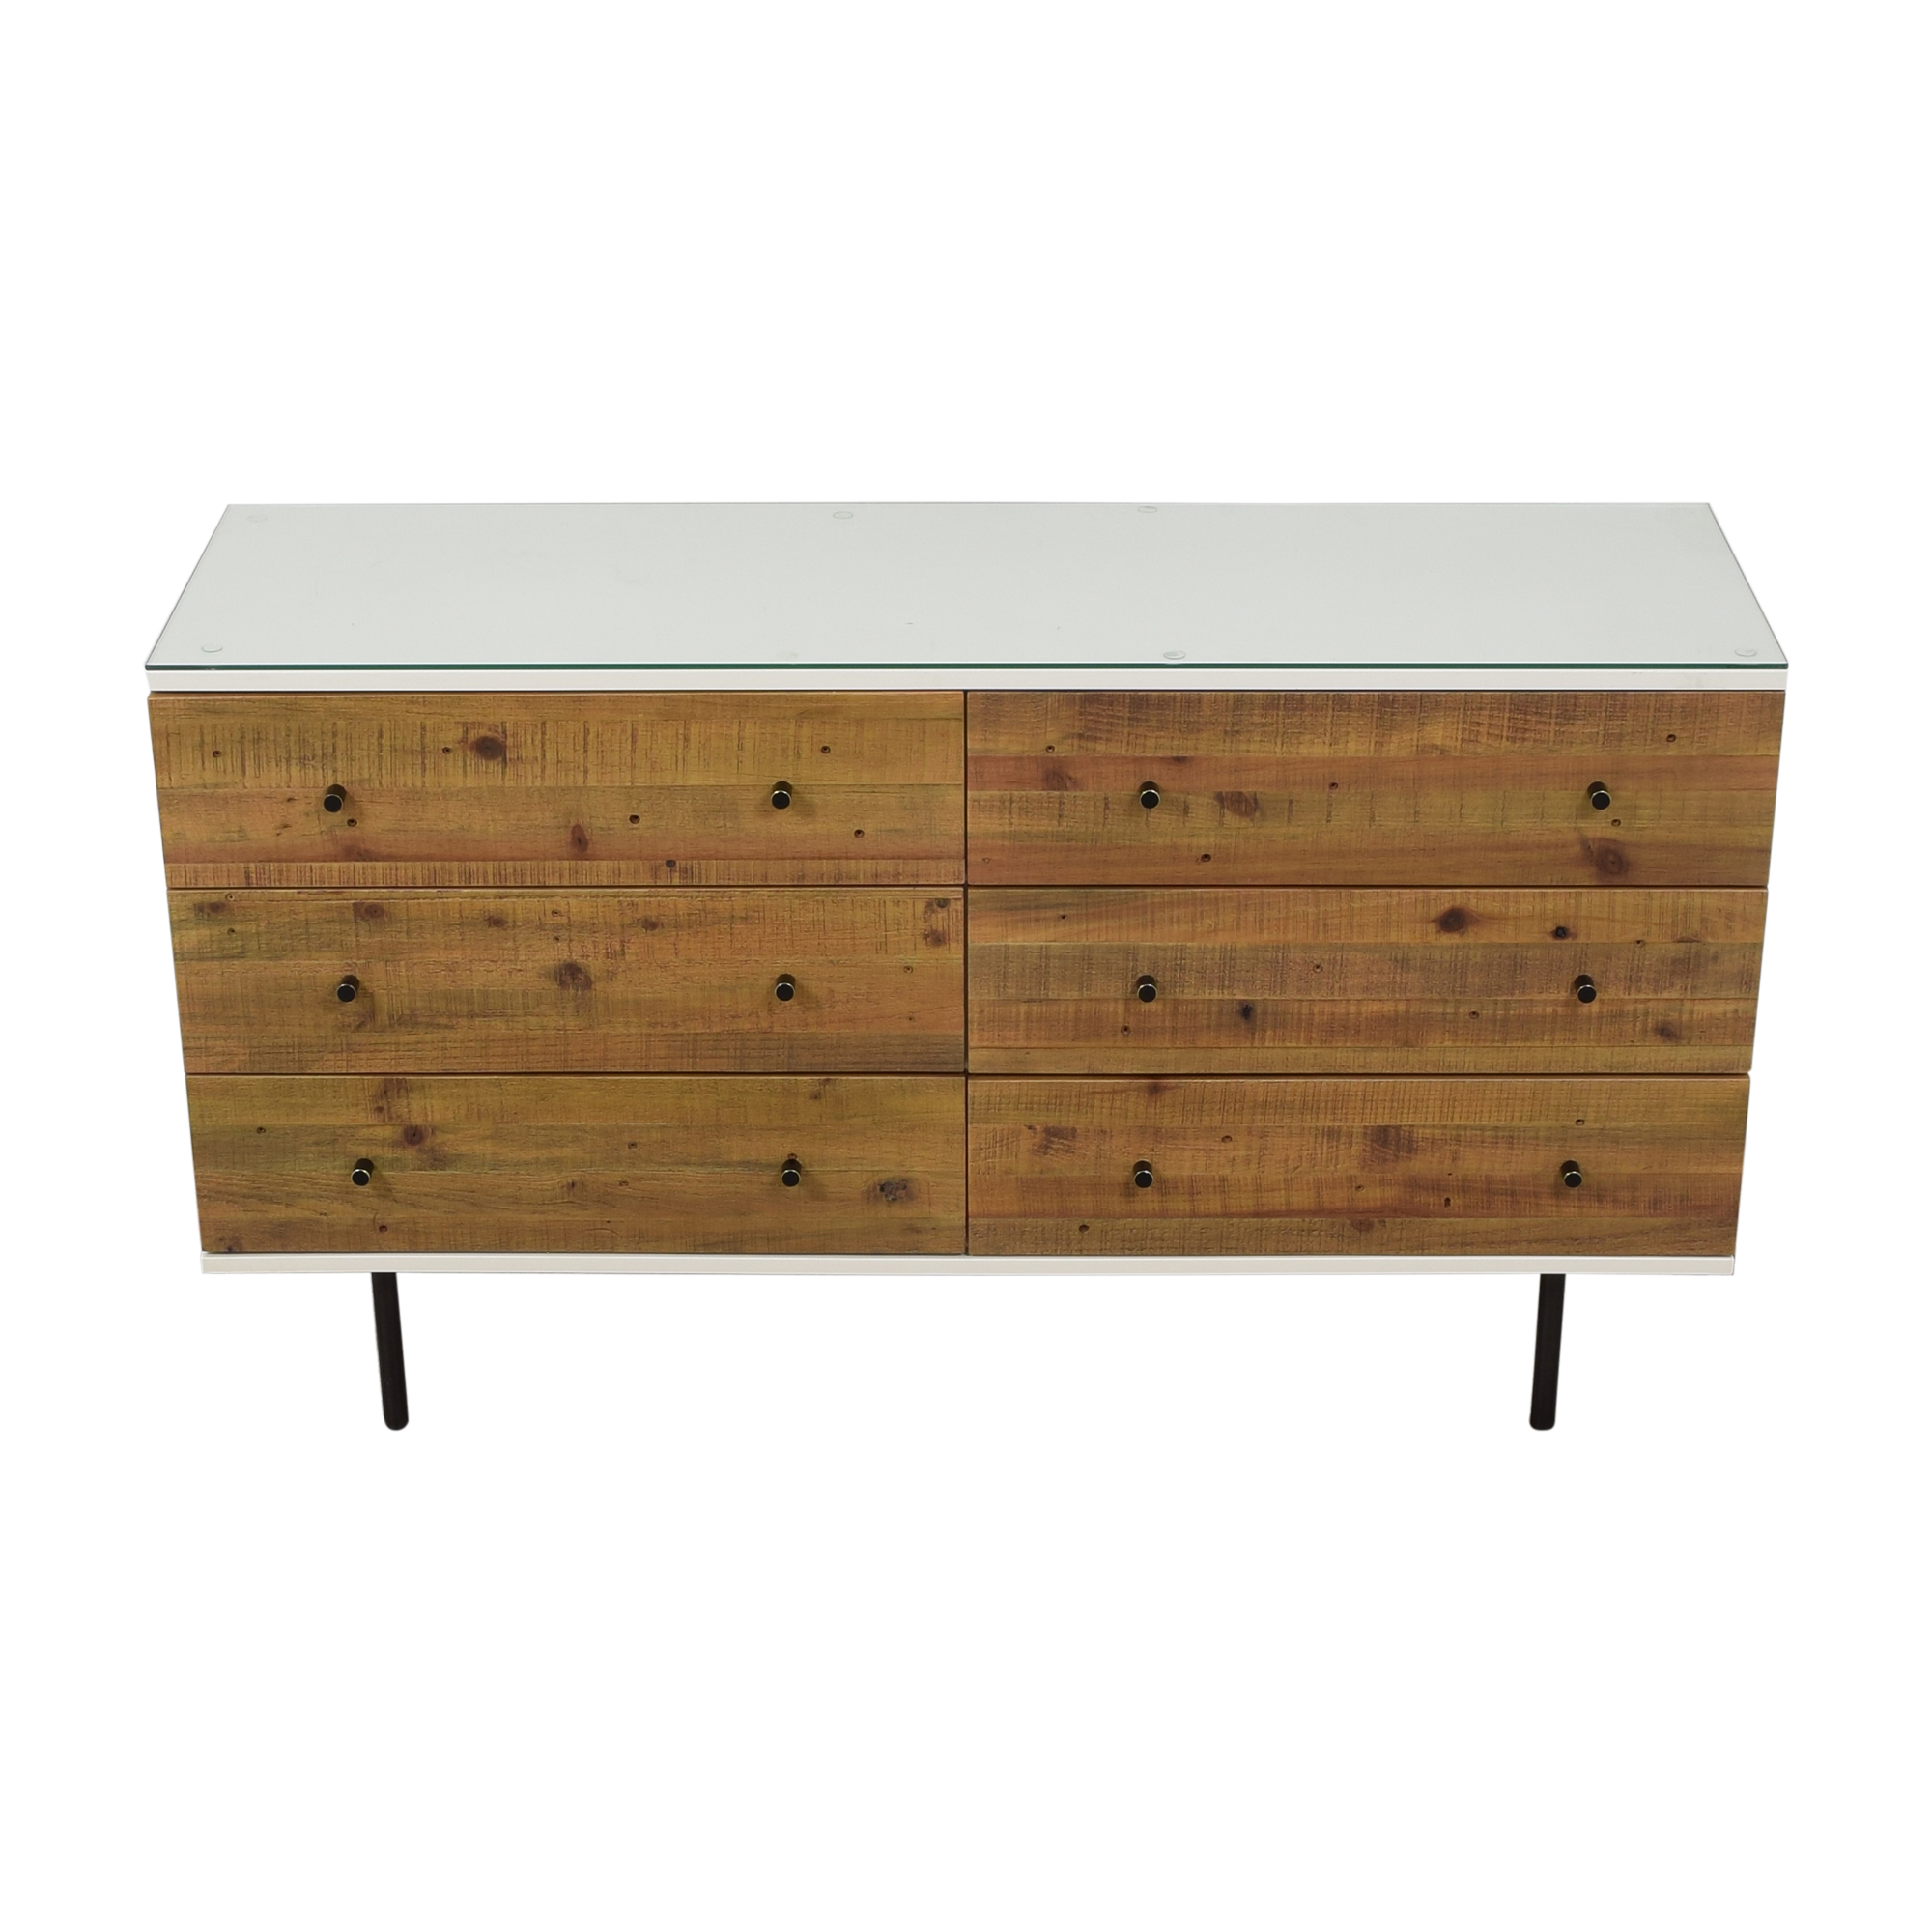 West Elm West Elm Reclaimed Six Drawer Dresser price